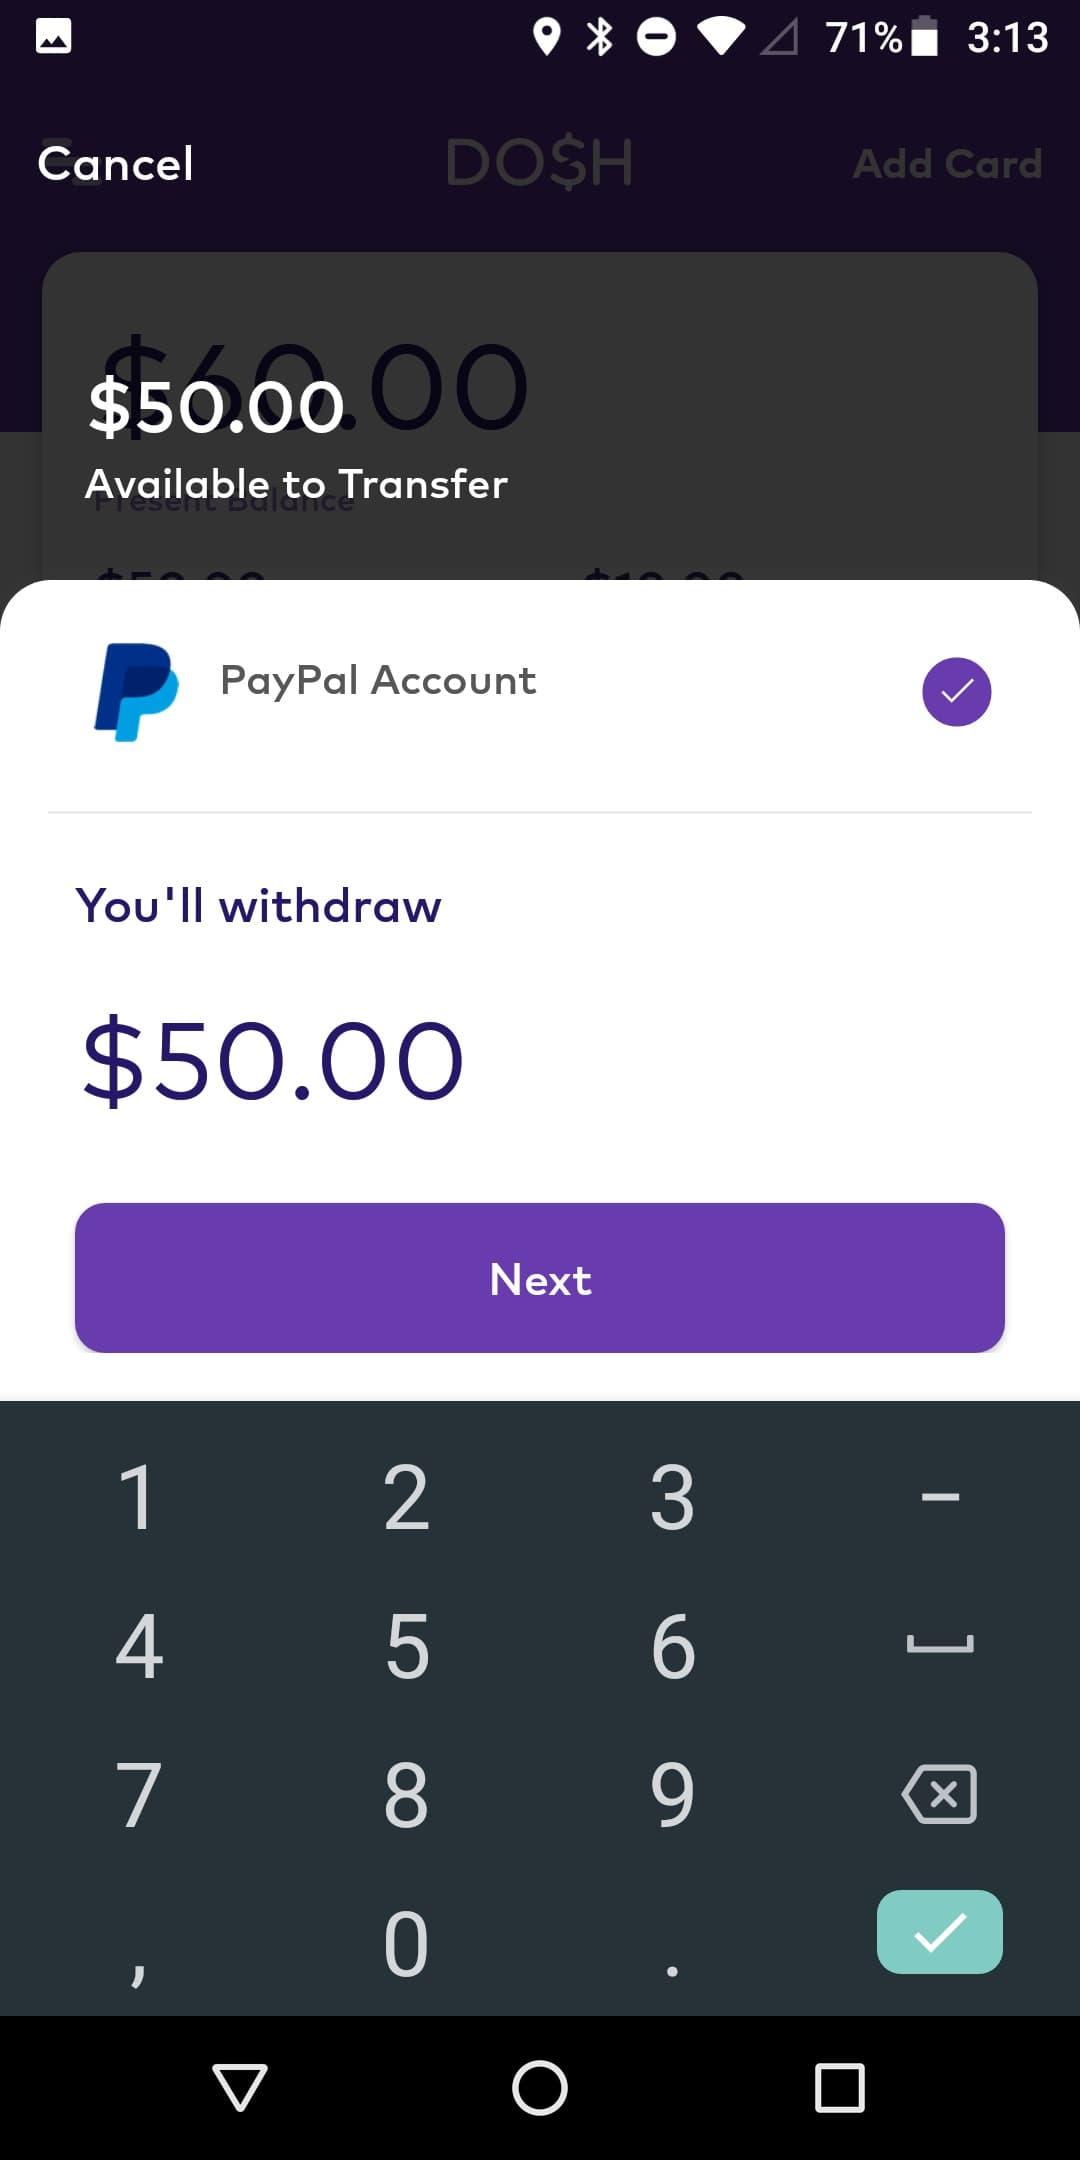 Dosh $50 payment